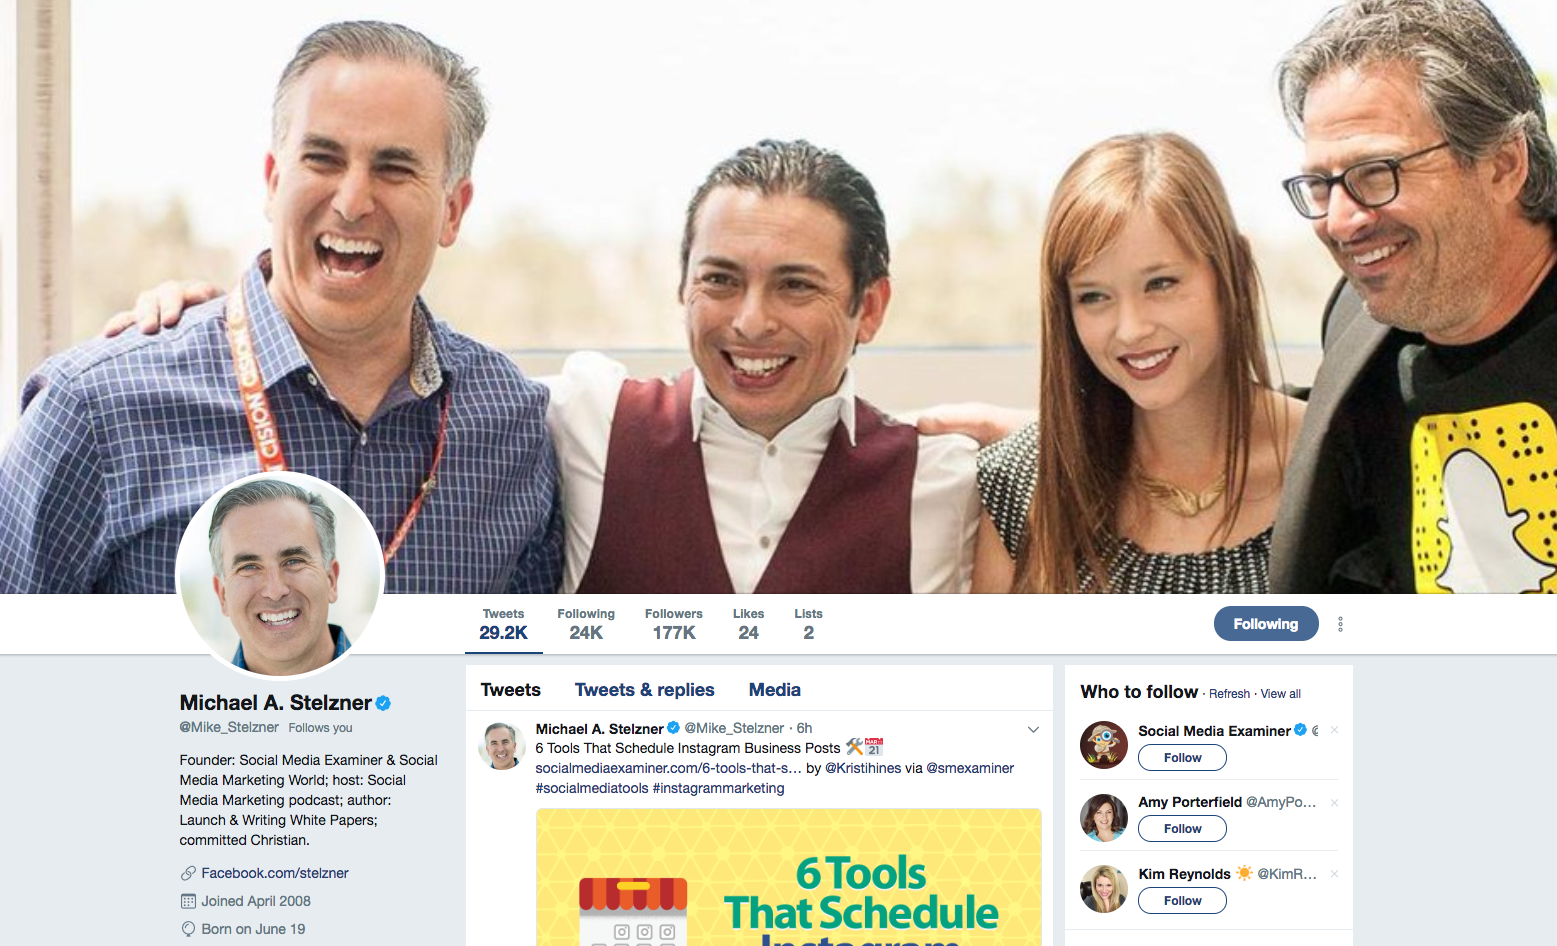 Michael Stelzner top social Media marketing influencers